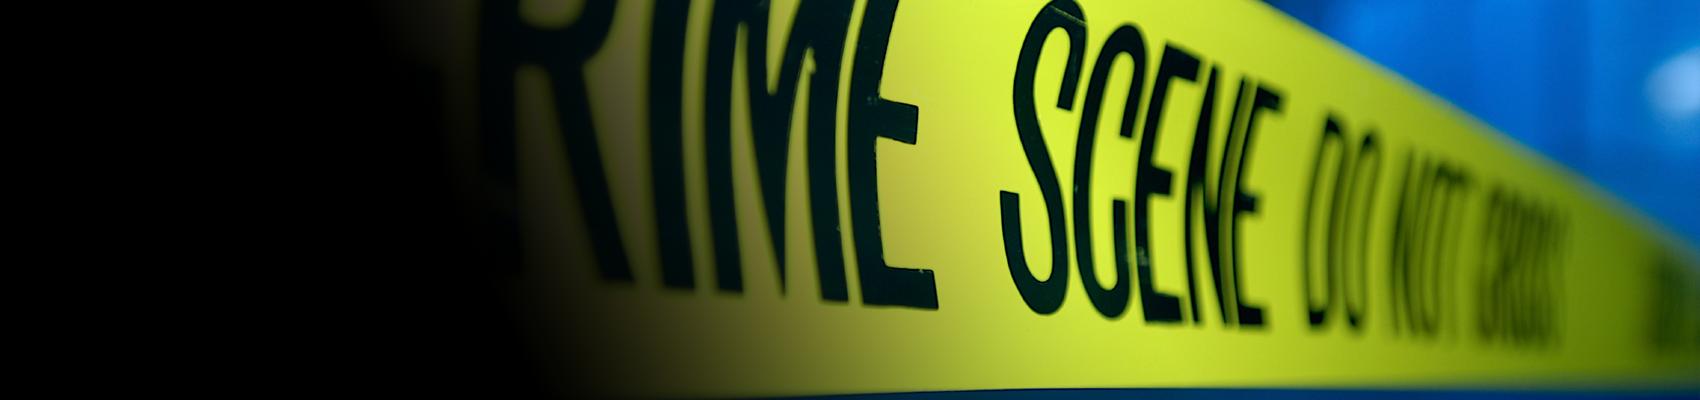 Criminology – Study at Monash University